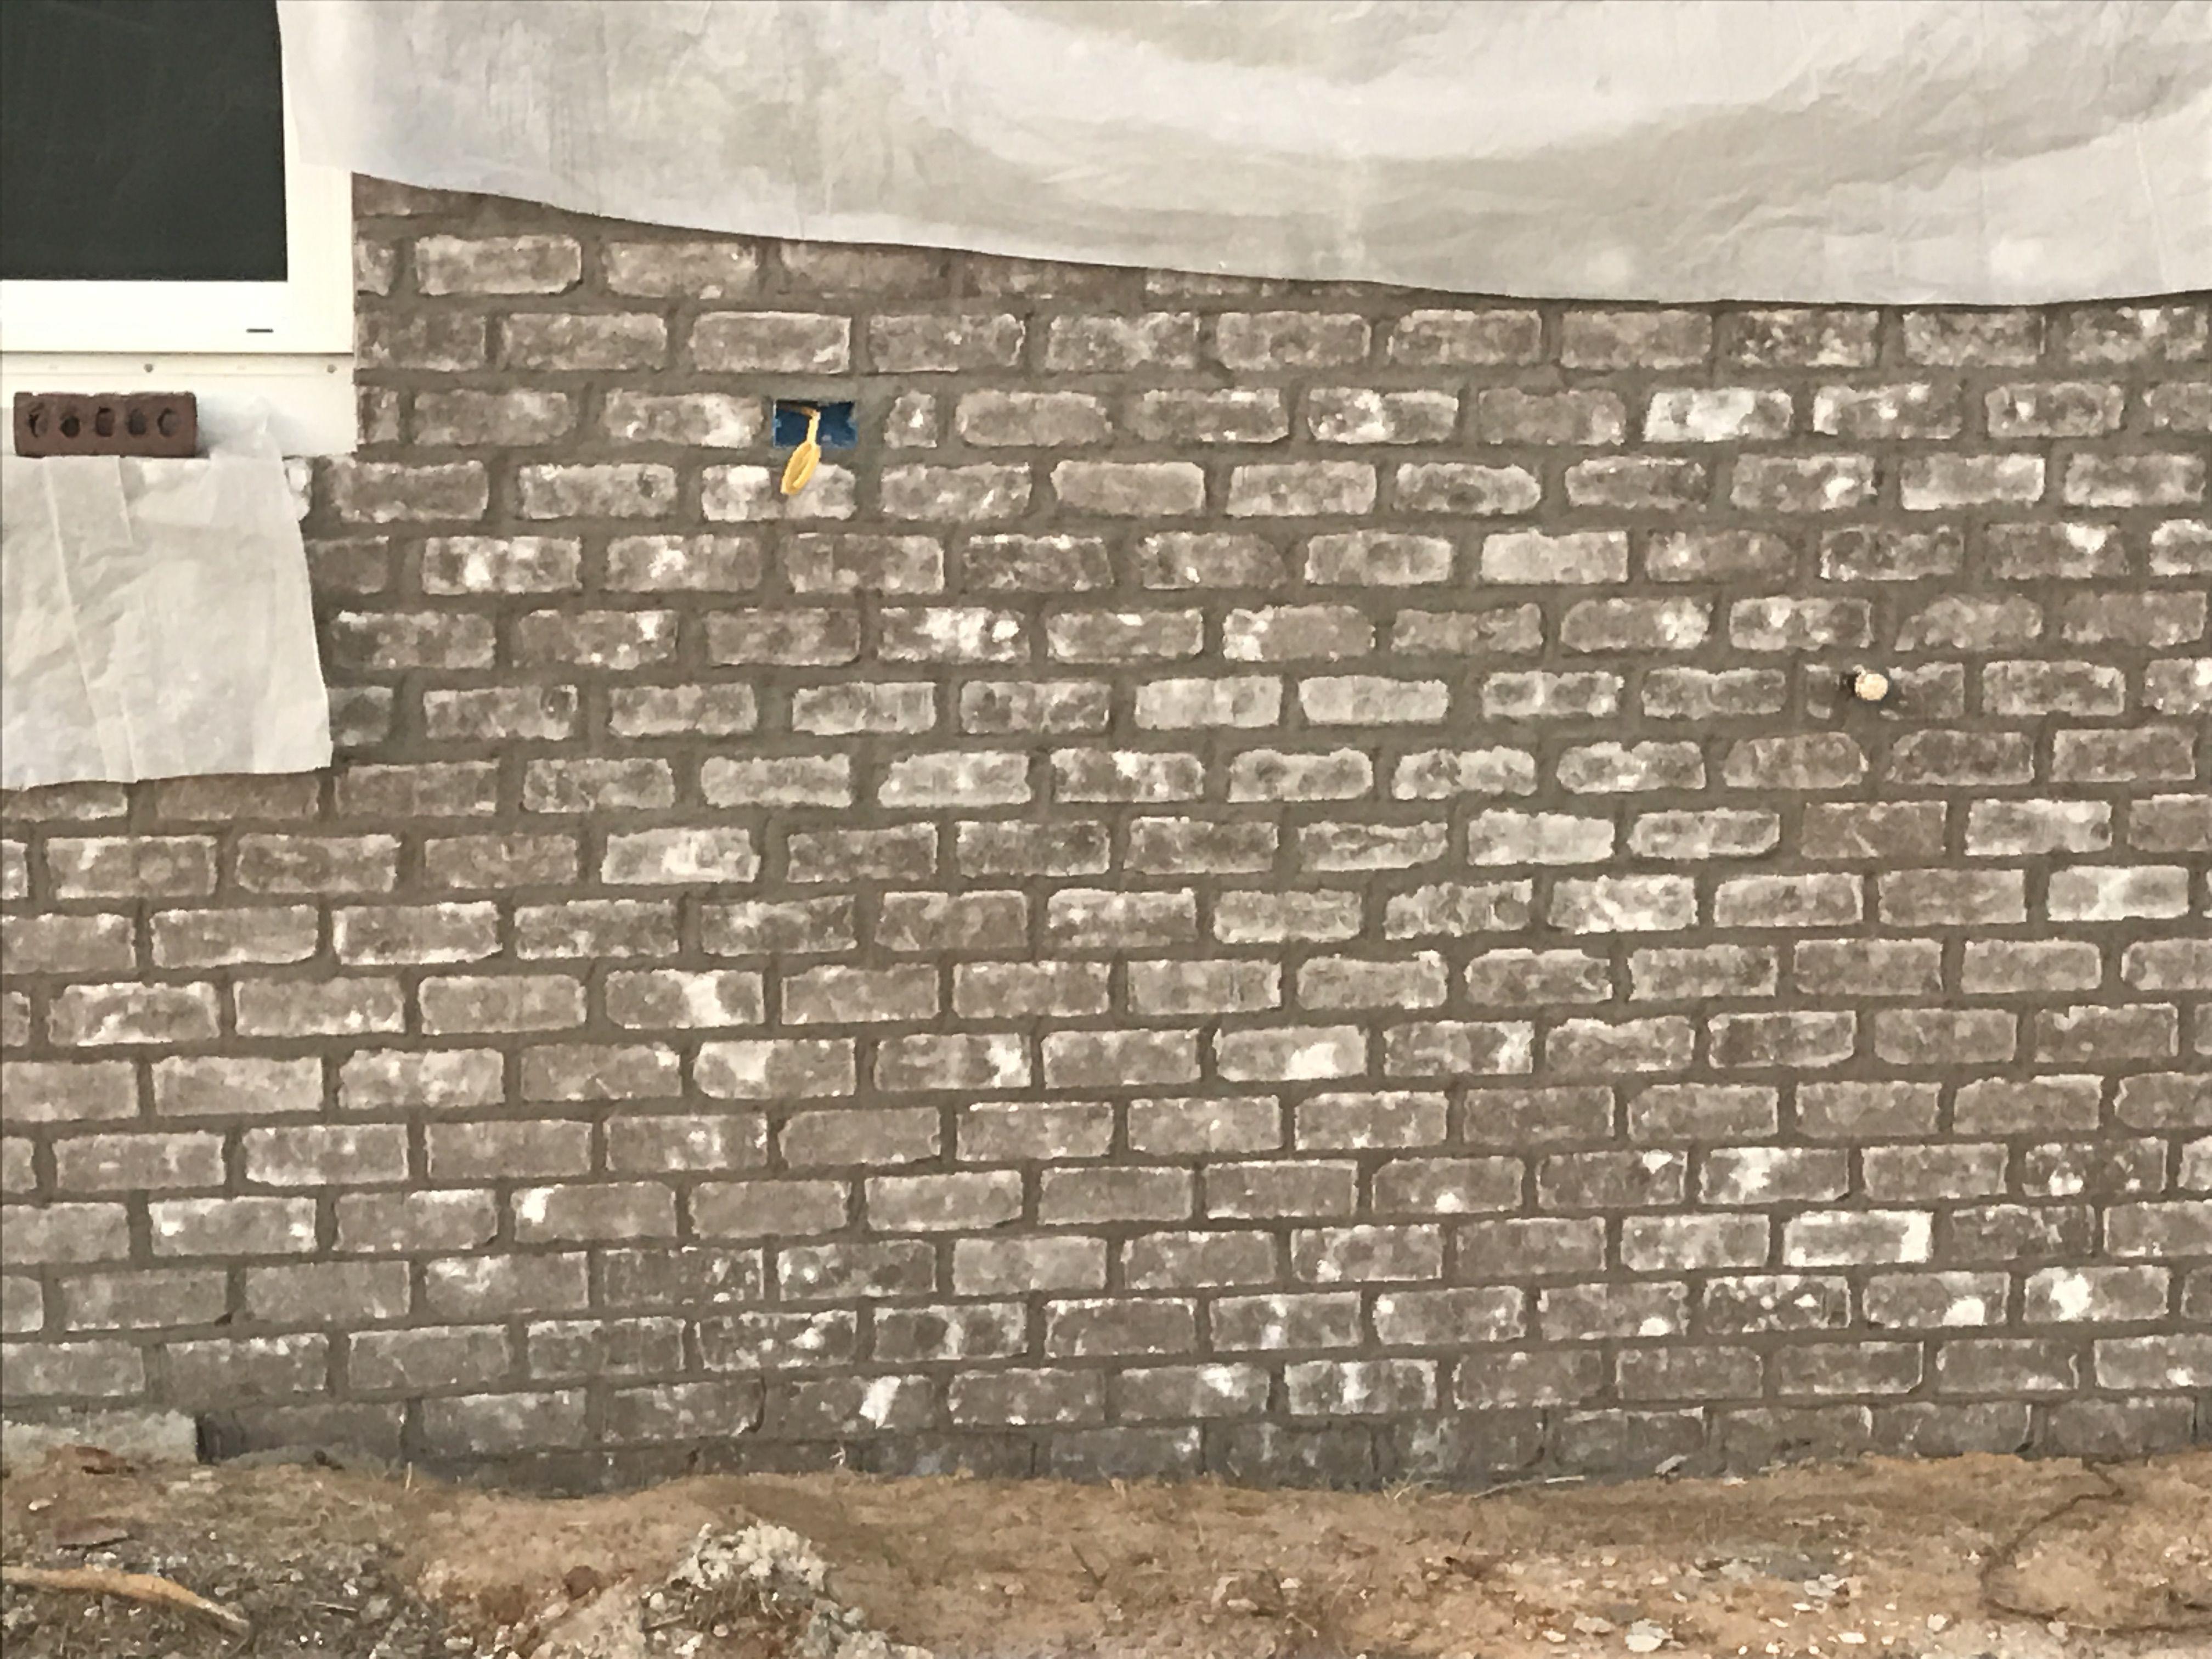 Castle Rock Tudor Brick General Shale With Gray Mortar